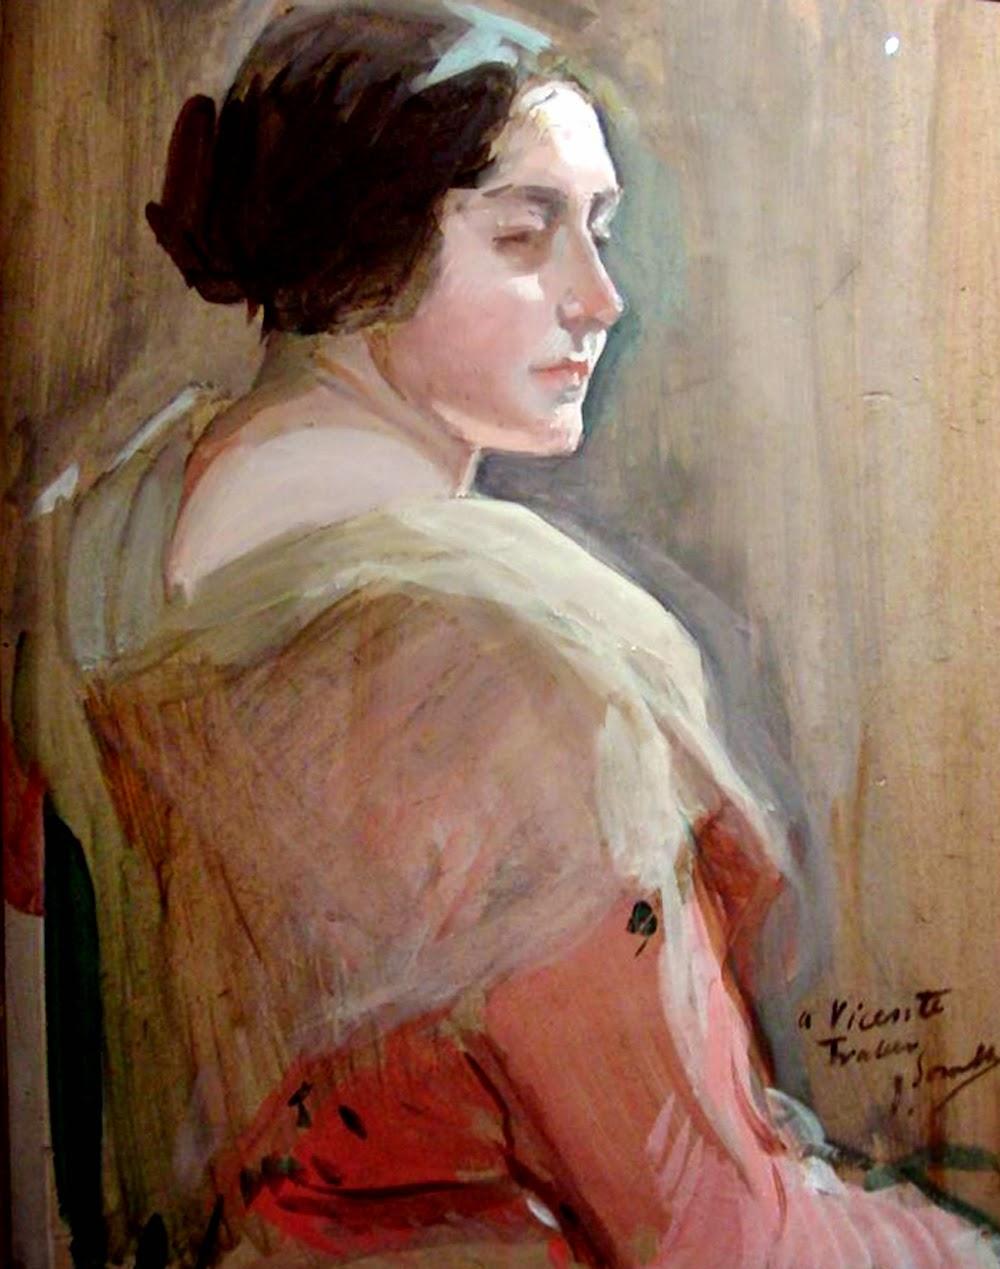 Joaquín Sorolla Bastida, Retratos de Joaquín Sorolla, Retrato de una Mujer, Joaquín Sorolla, Pintor español